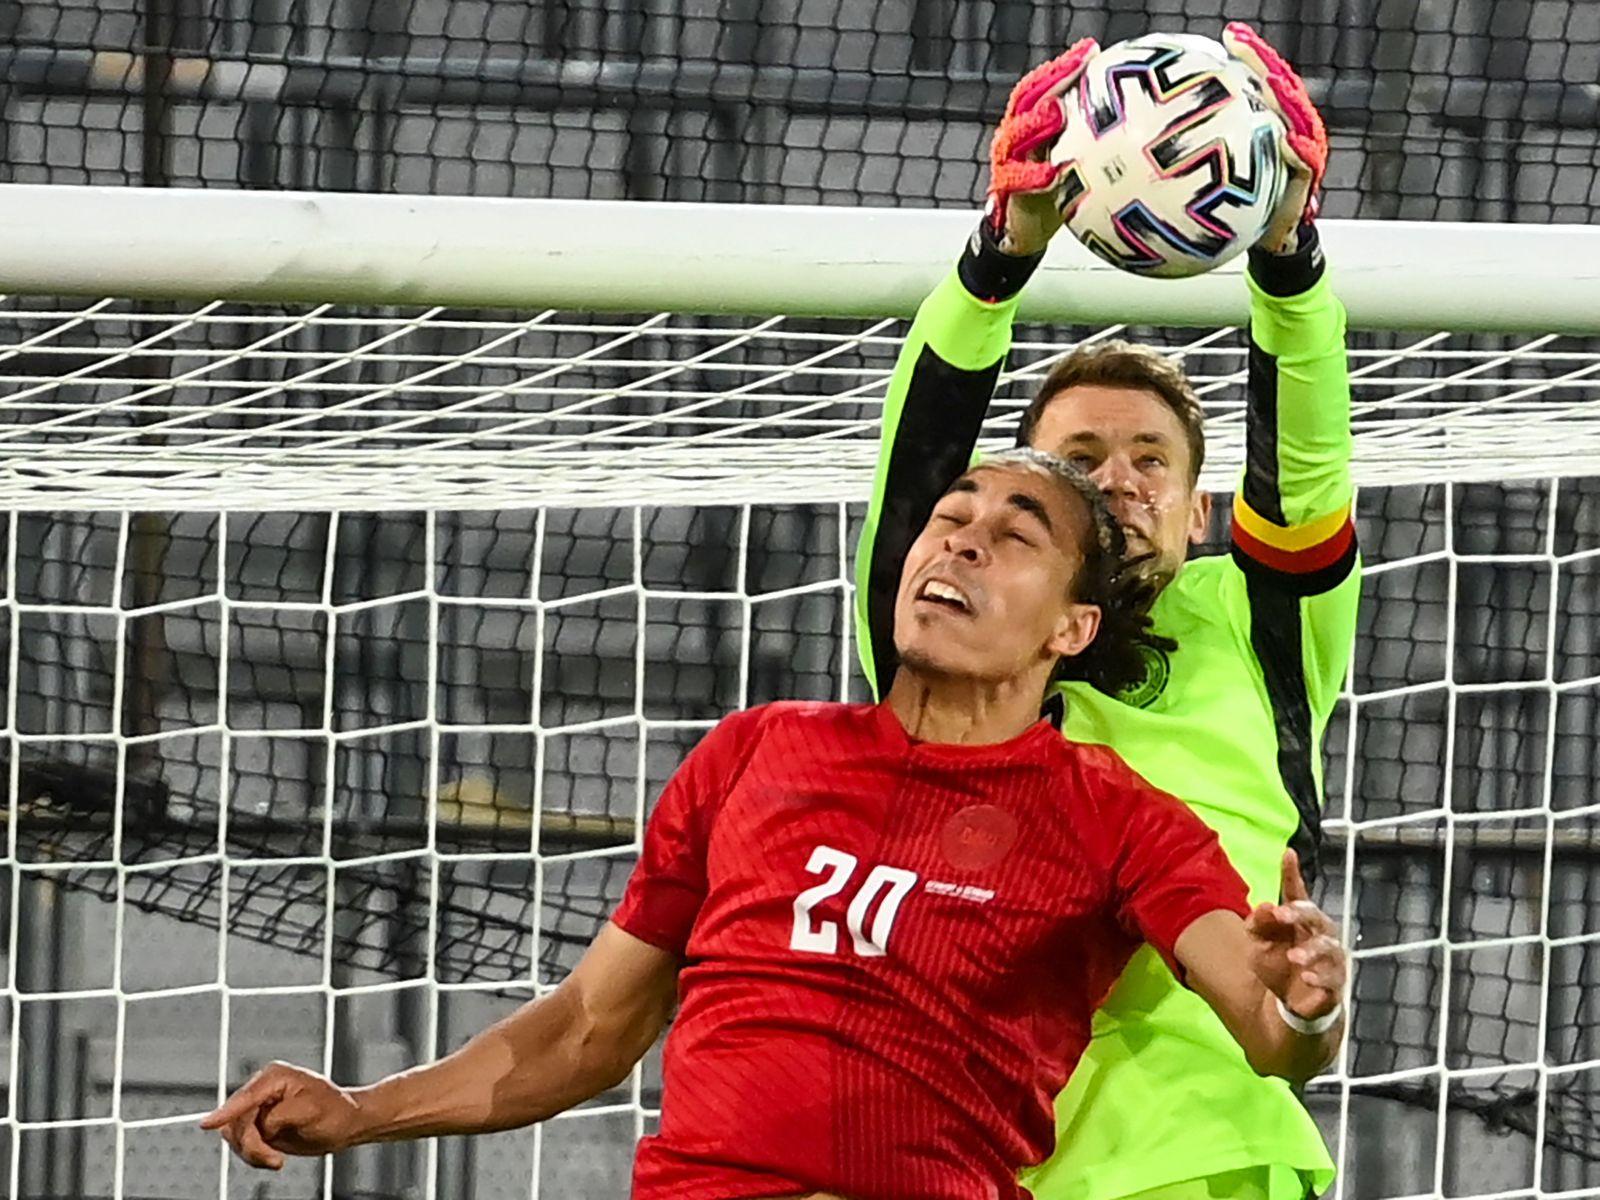 FBL-EURO-2020-2021-FRIENDLY-GER-DEN